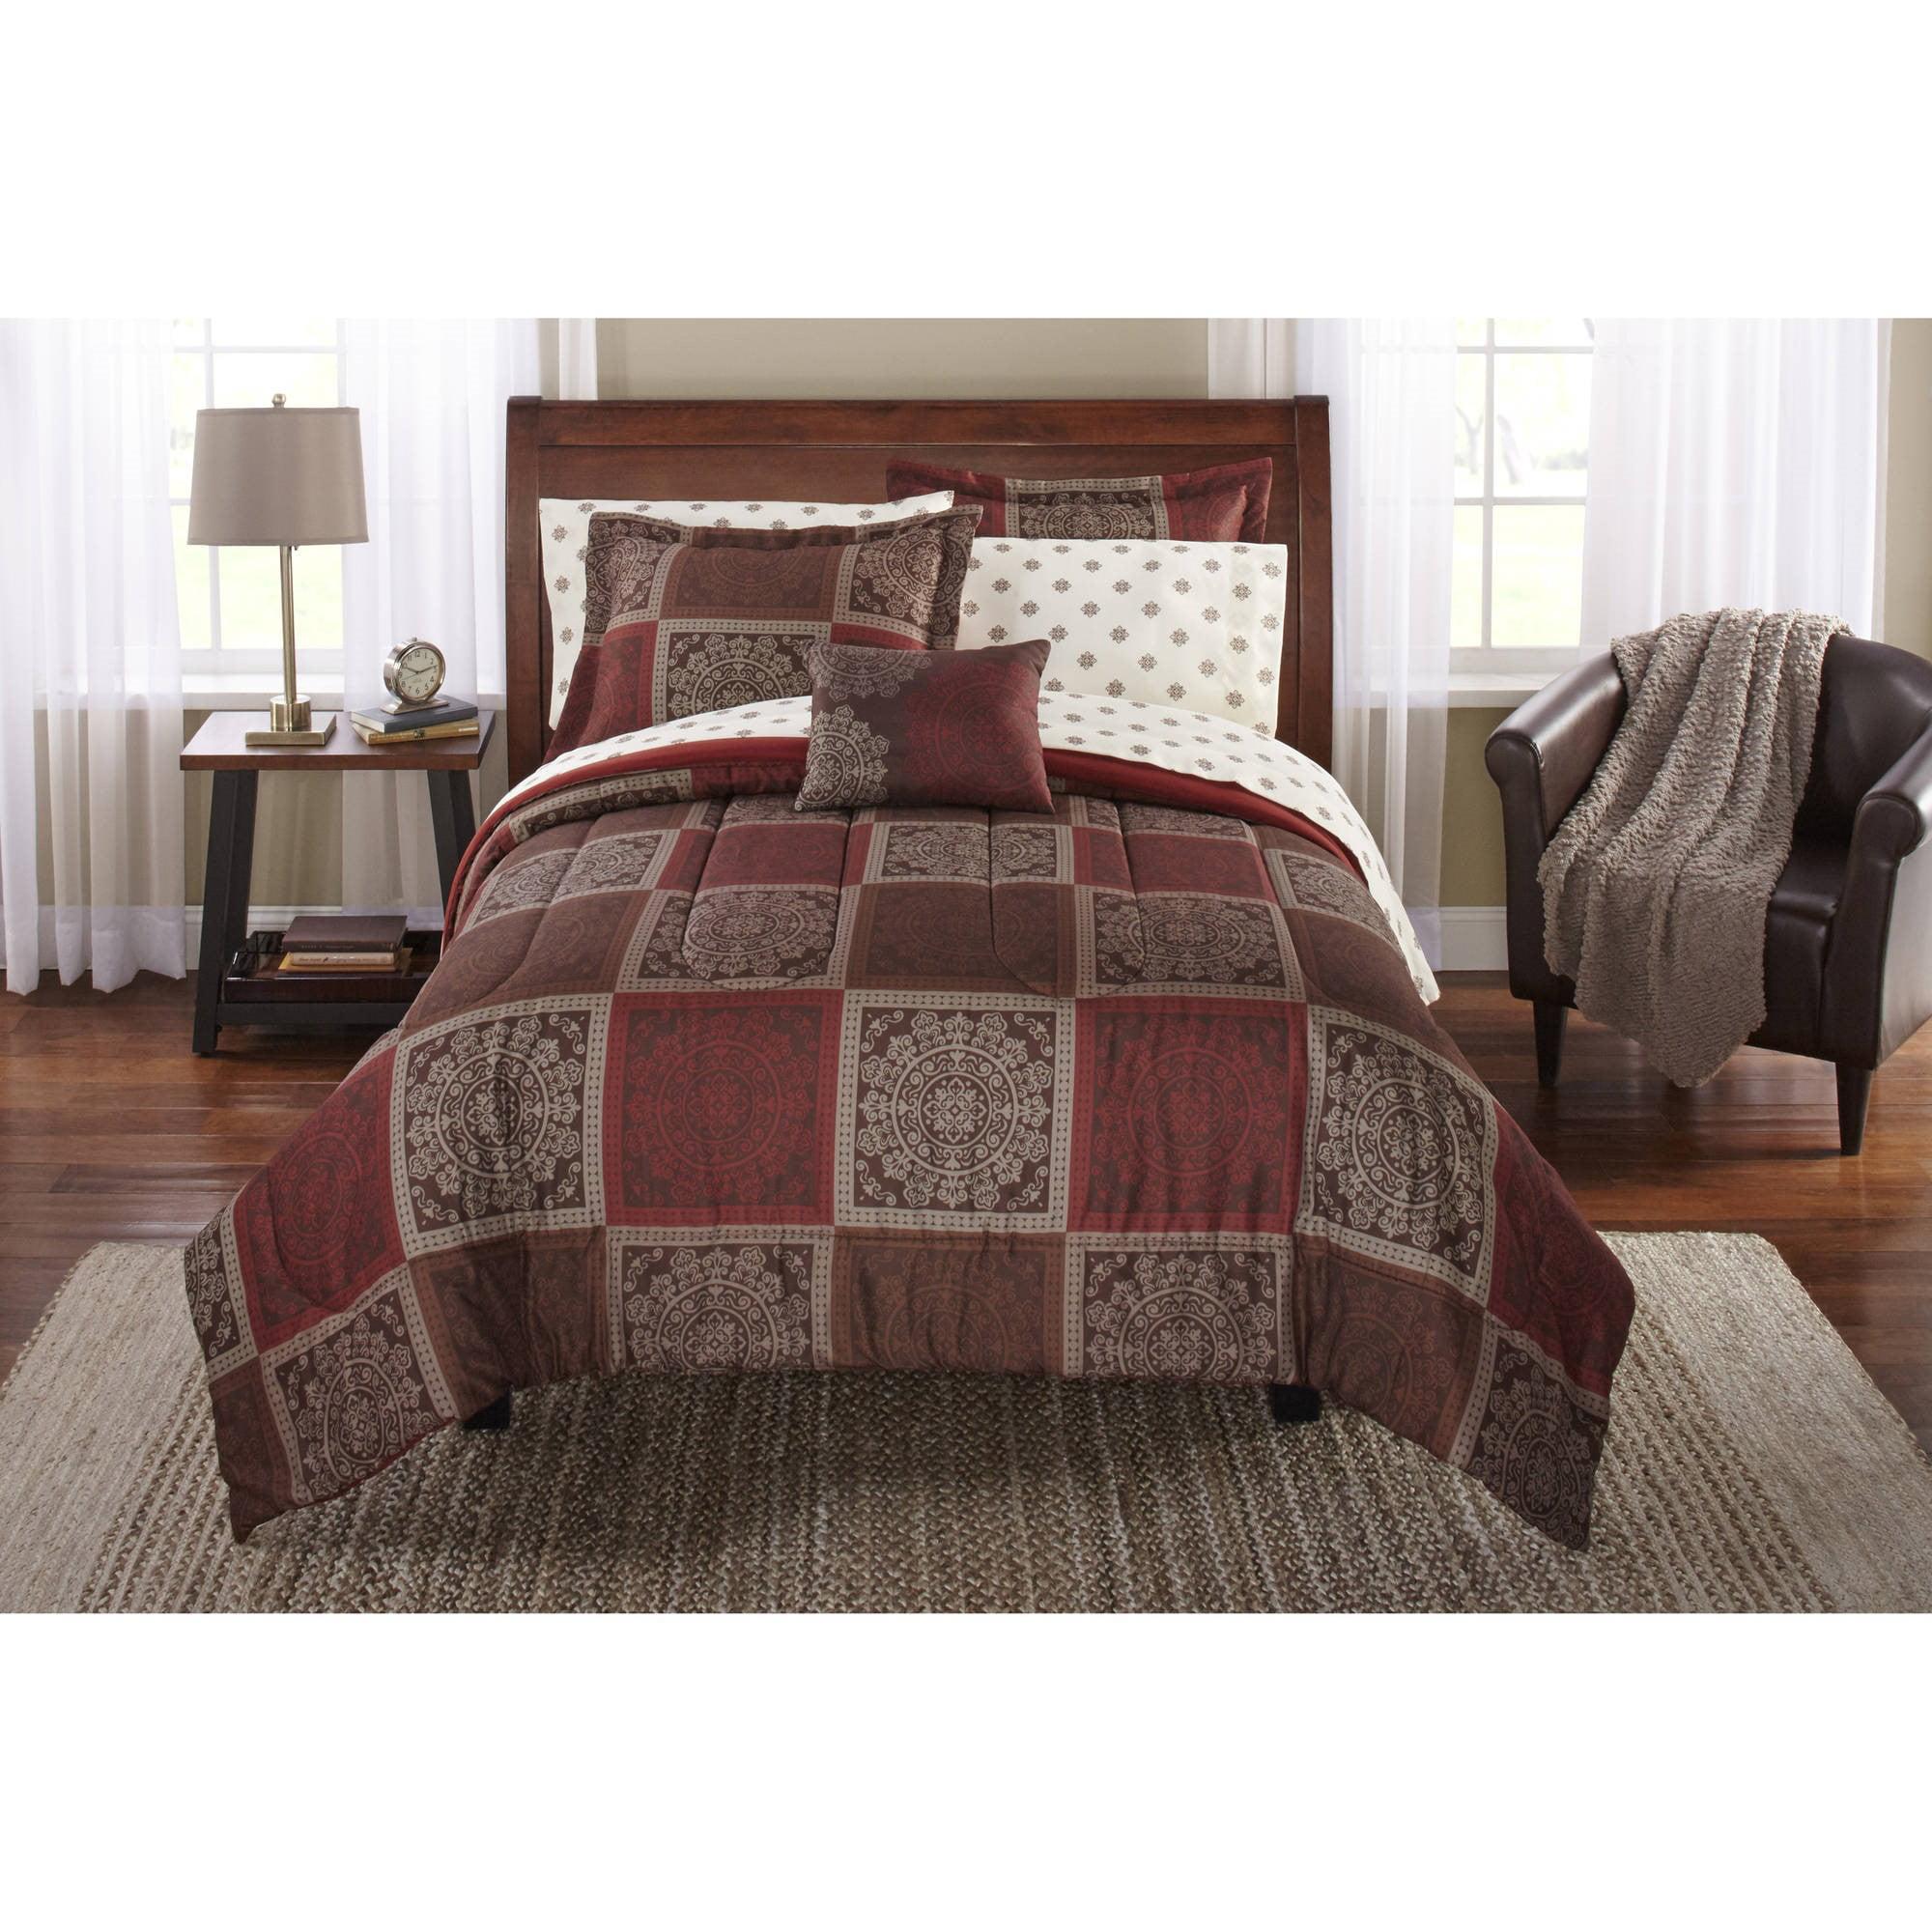 Mainstays Tiles Bed In A Bag Bedding Comforter Set Full Walmart Com Walmart Com